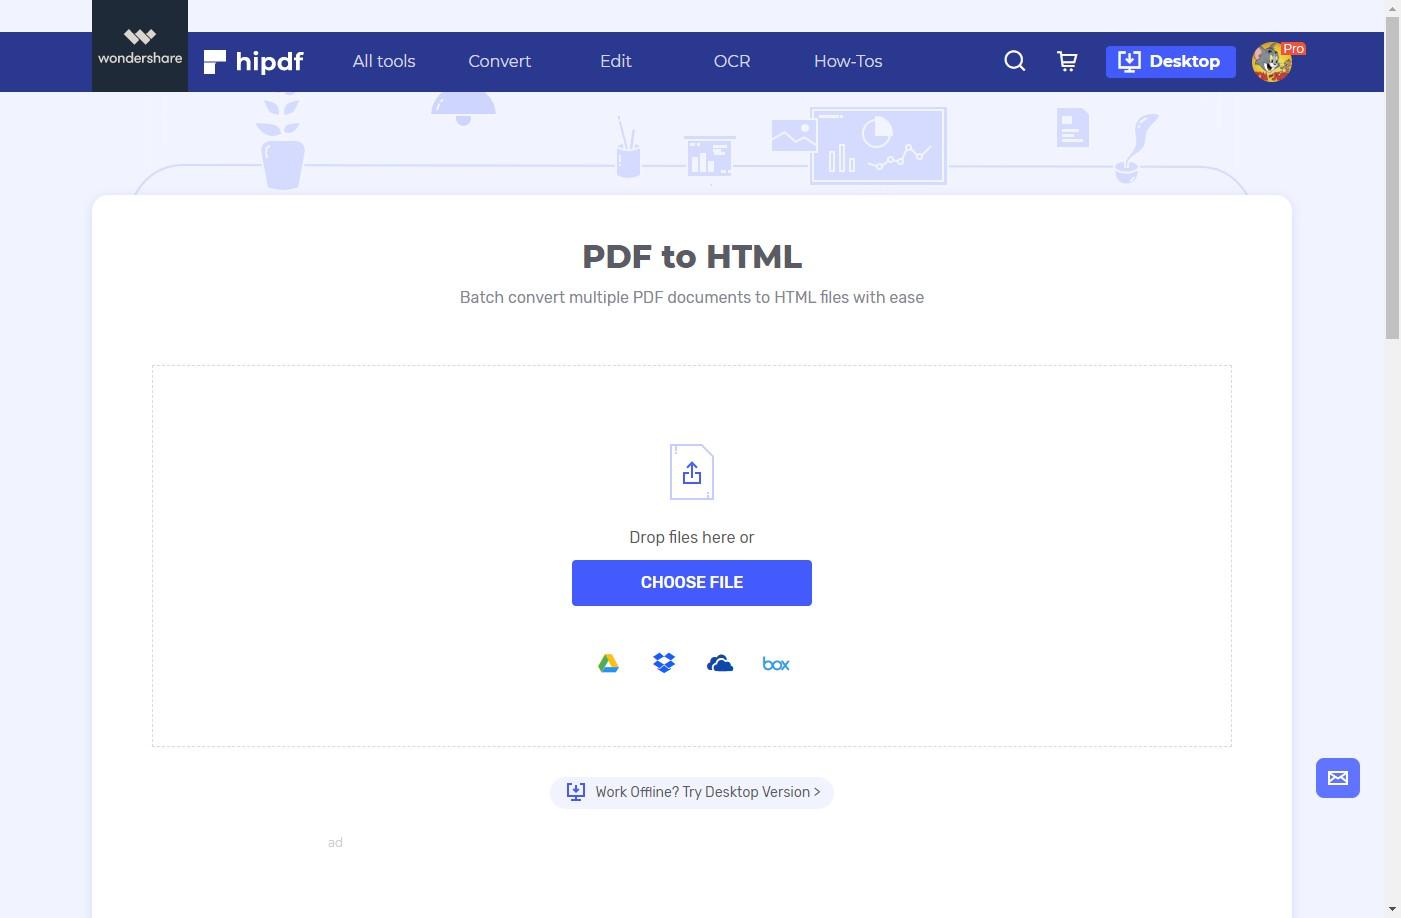 hipdf pdf to html converter